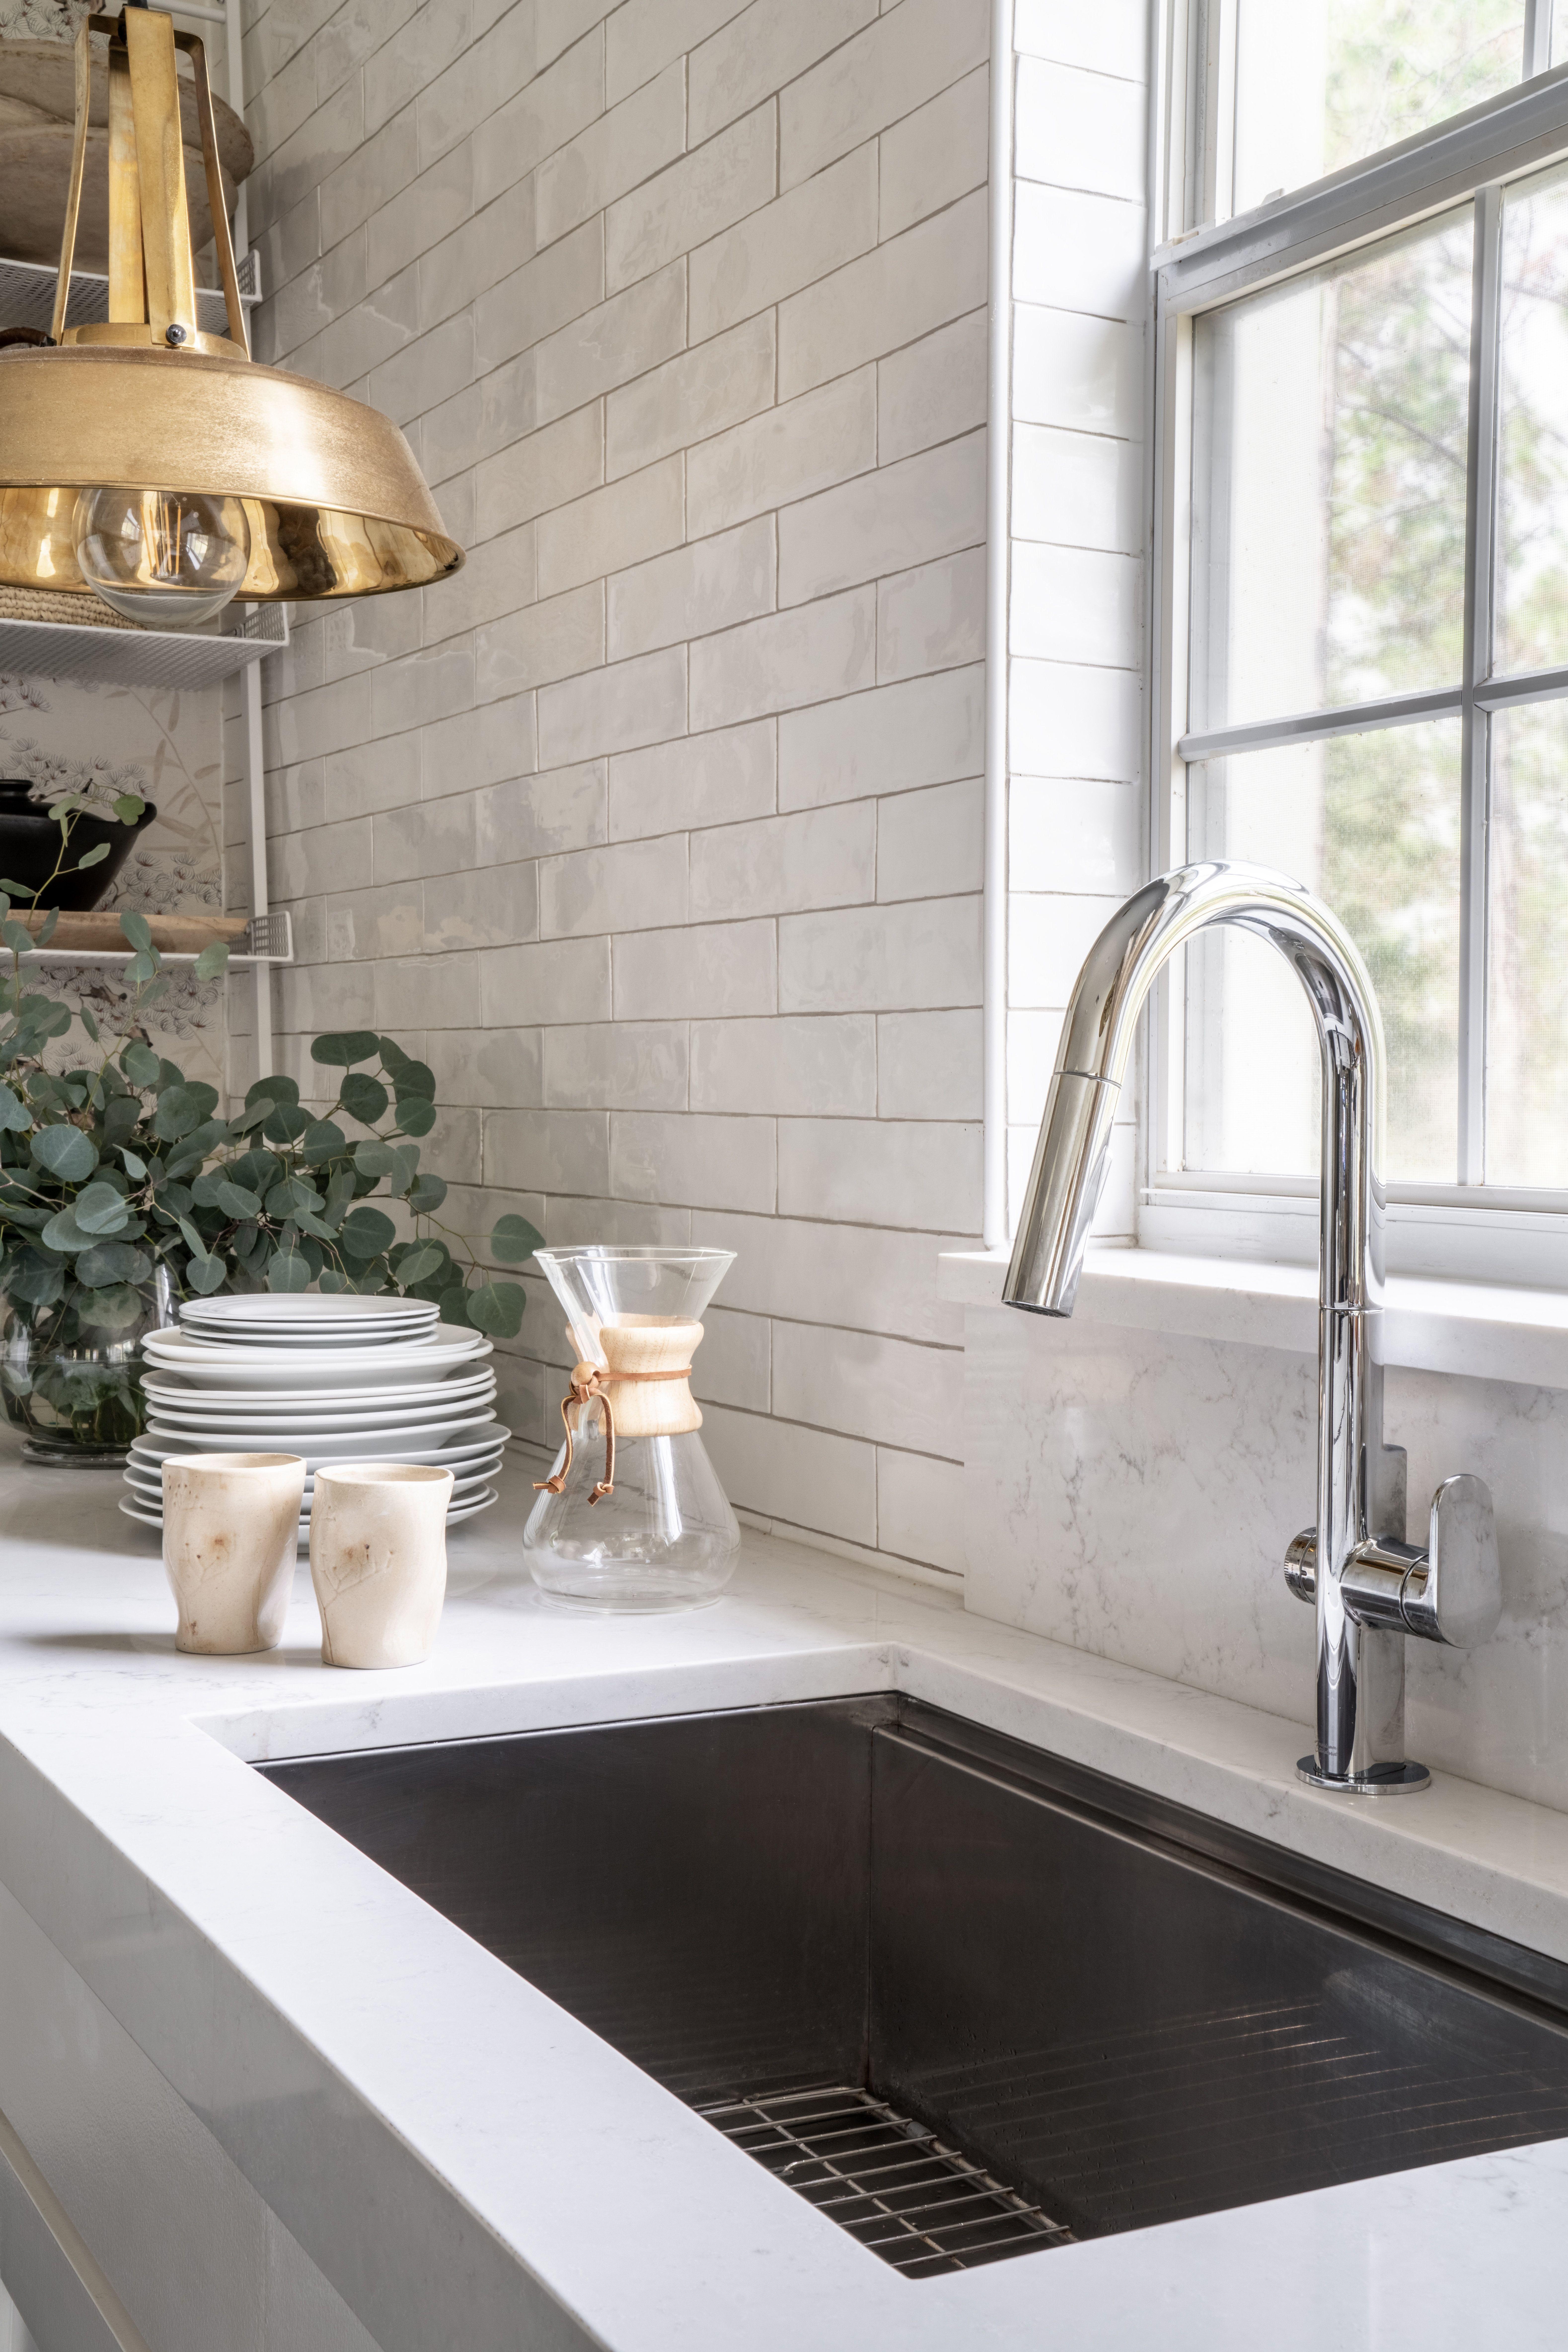 A Florida Designer Reinvents Her Kitchen By Removing The Upper Cabinets Kitchen Remodel Contemporary Kitchen Kitchen Renovation